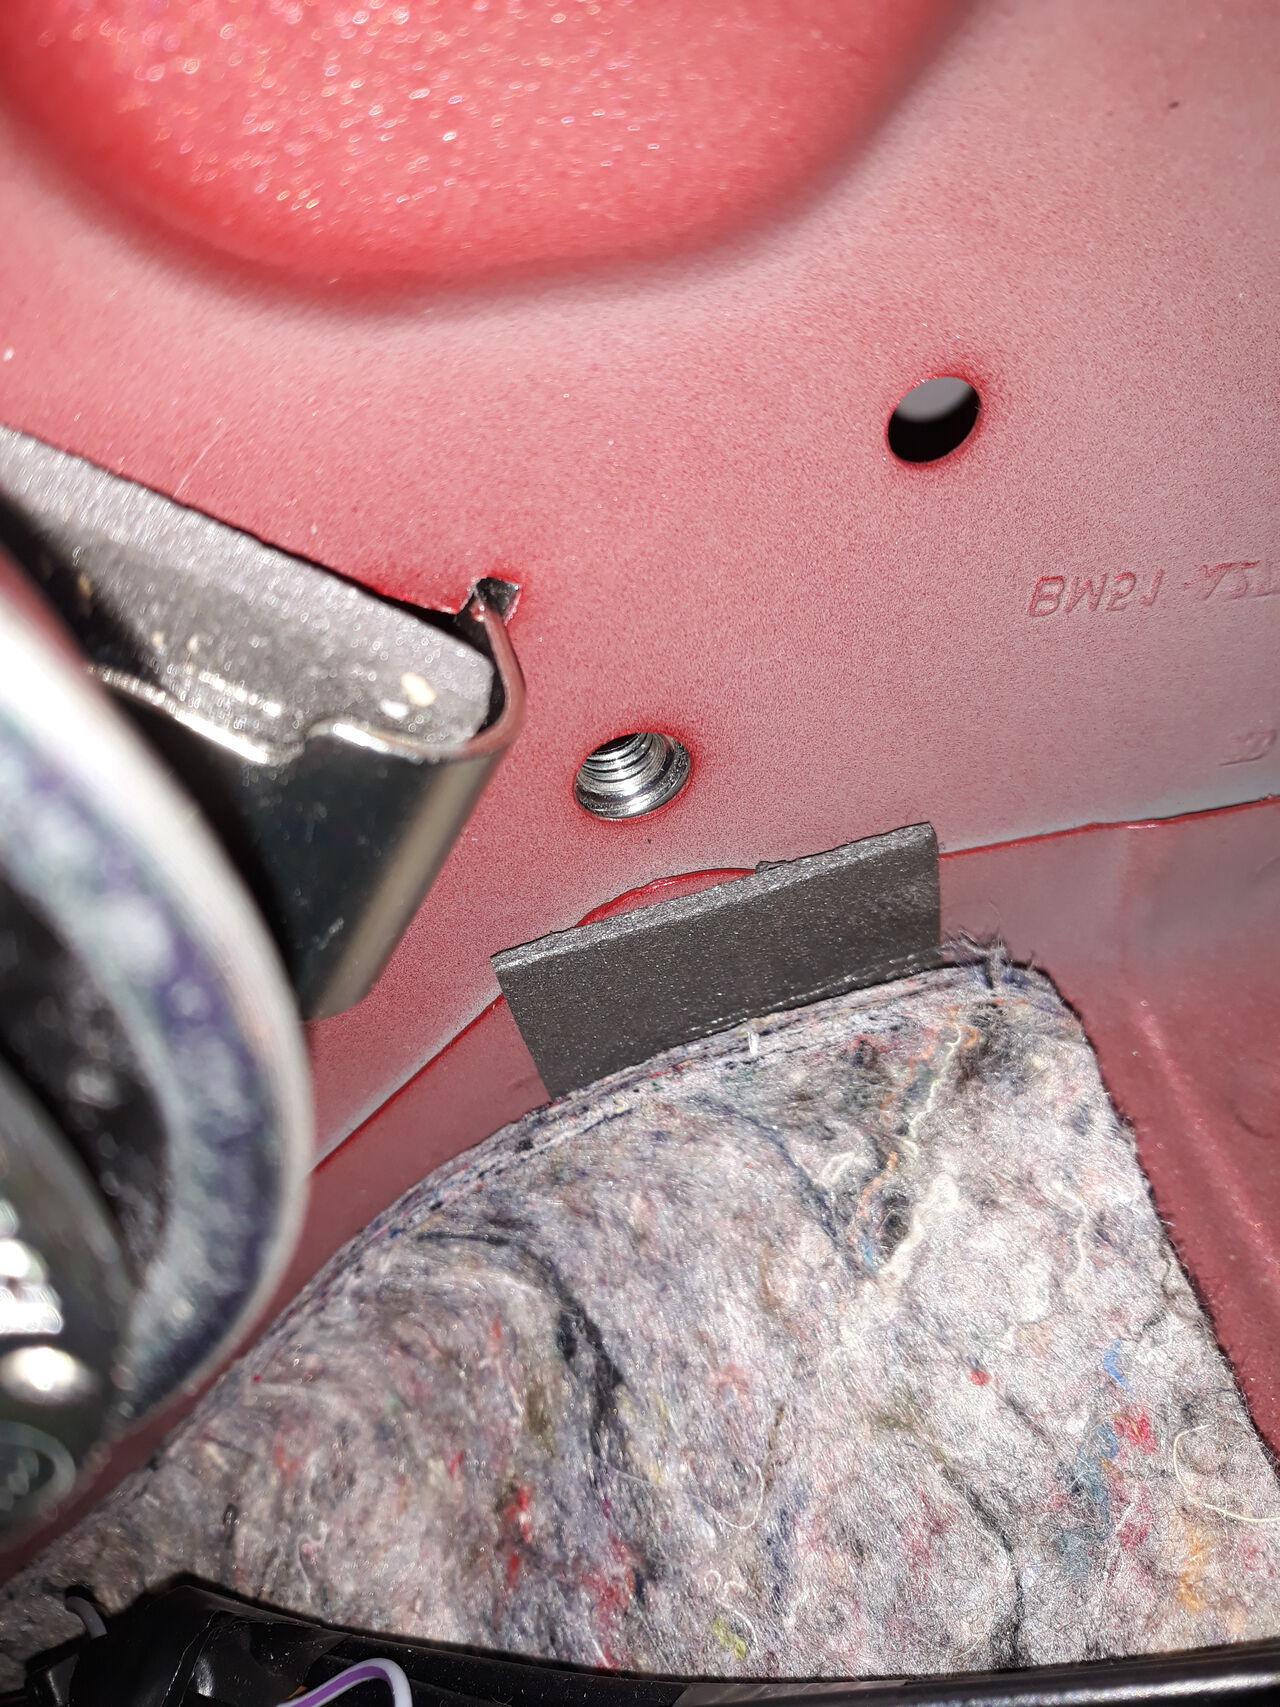 Ford Focus III - Alarm Hupe Innenraum - Bild 4.jpg